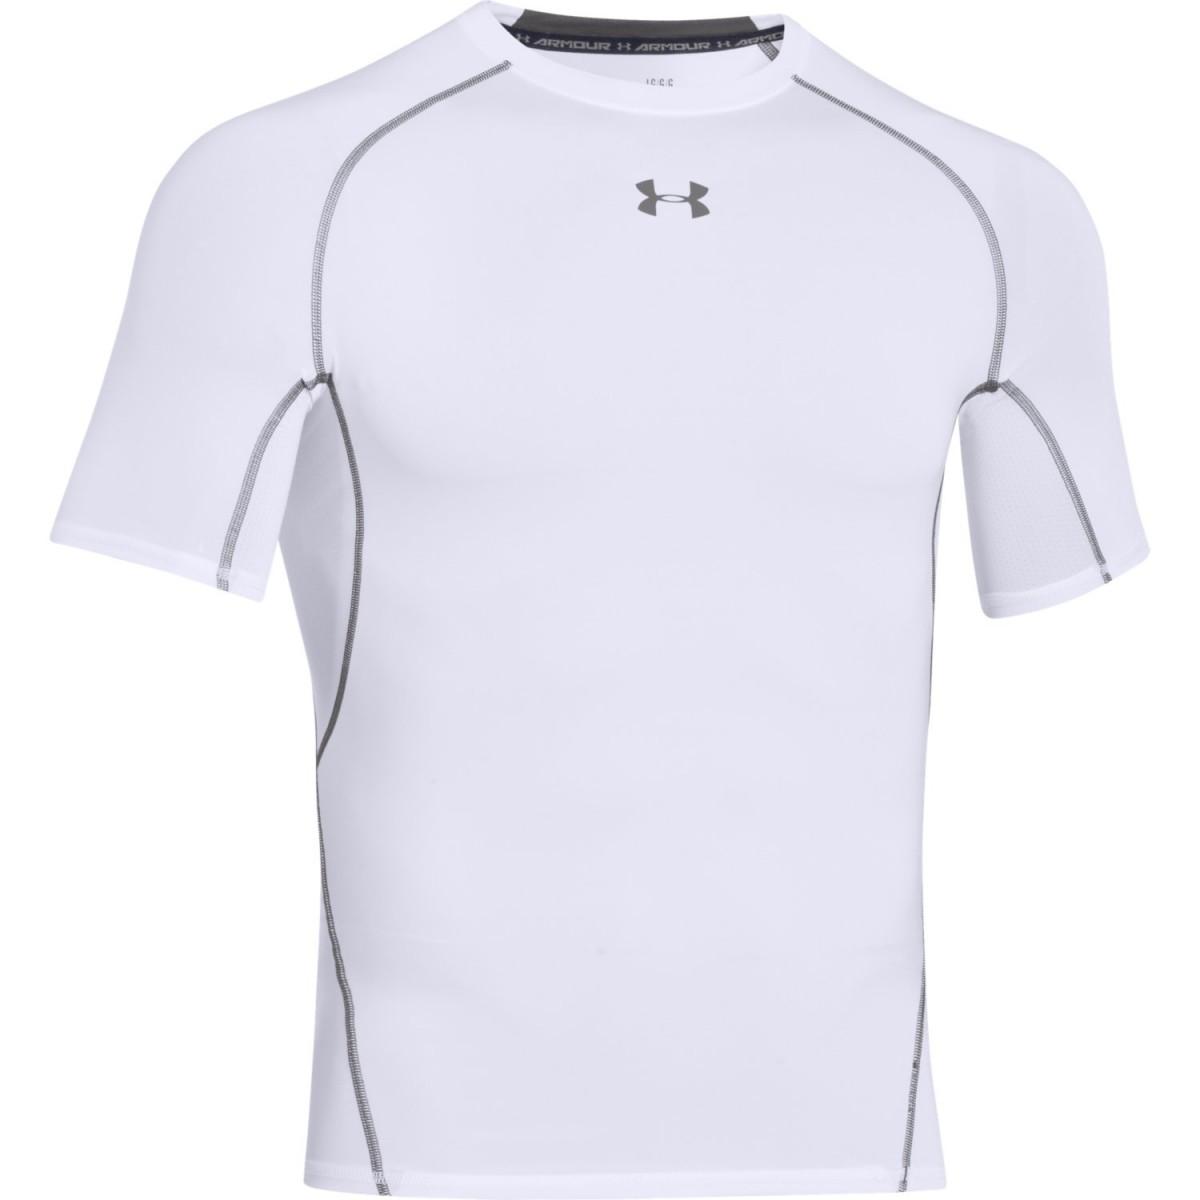 Under Armour T-Shirt Heatgear Bianca Uomo 1